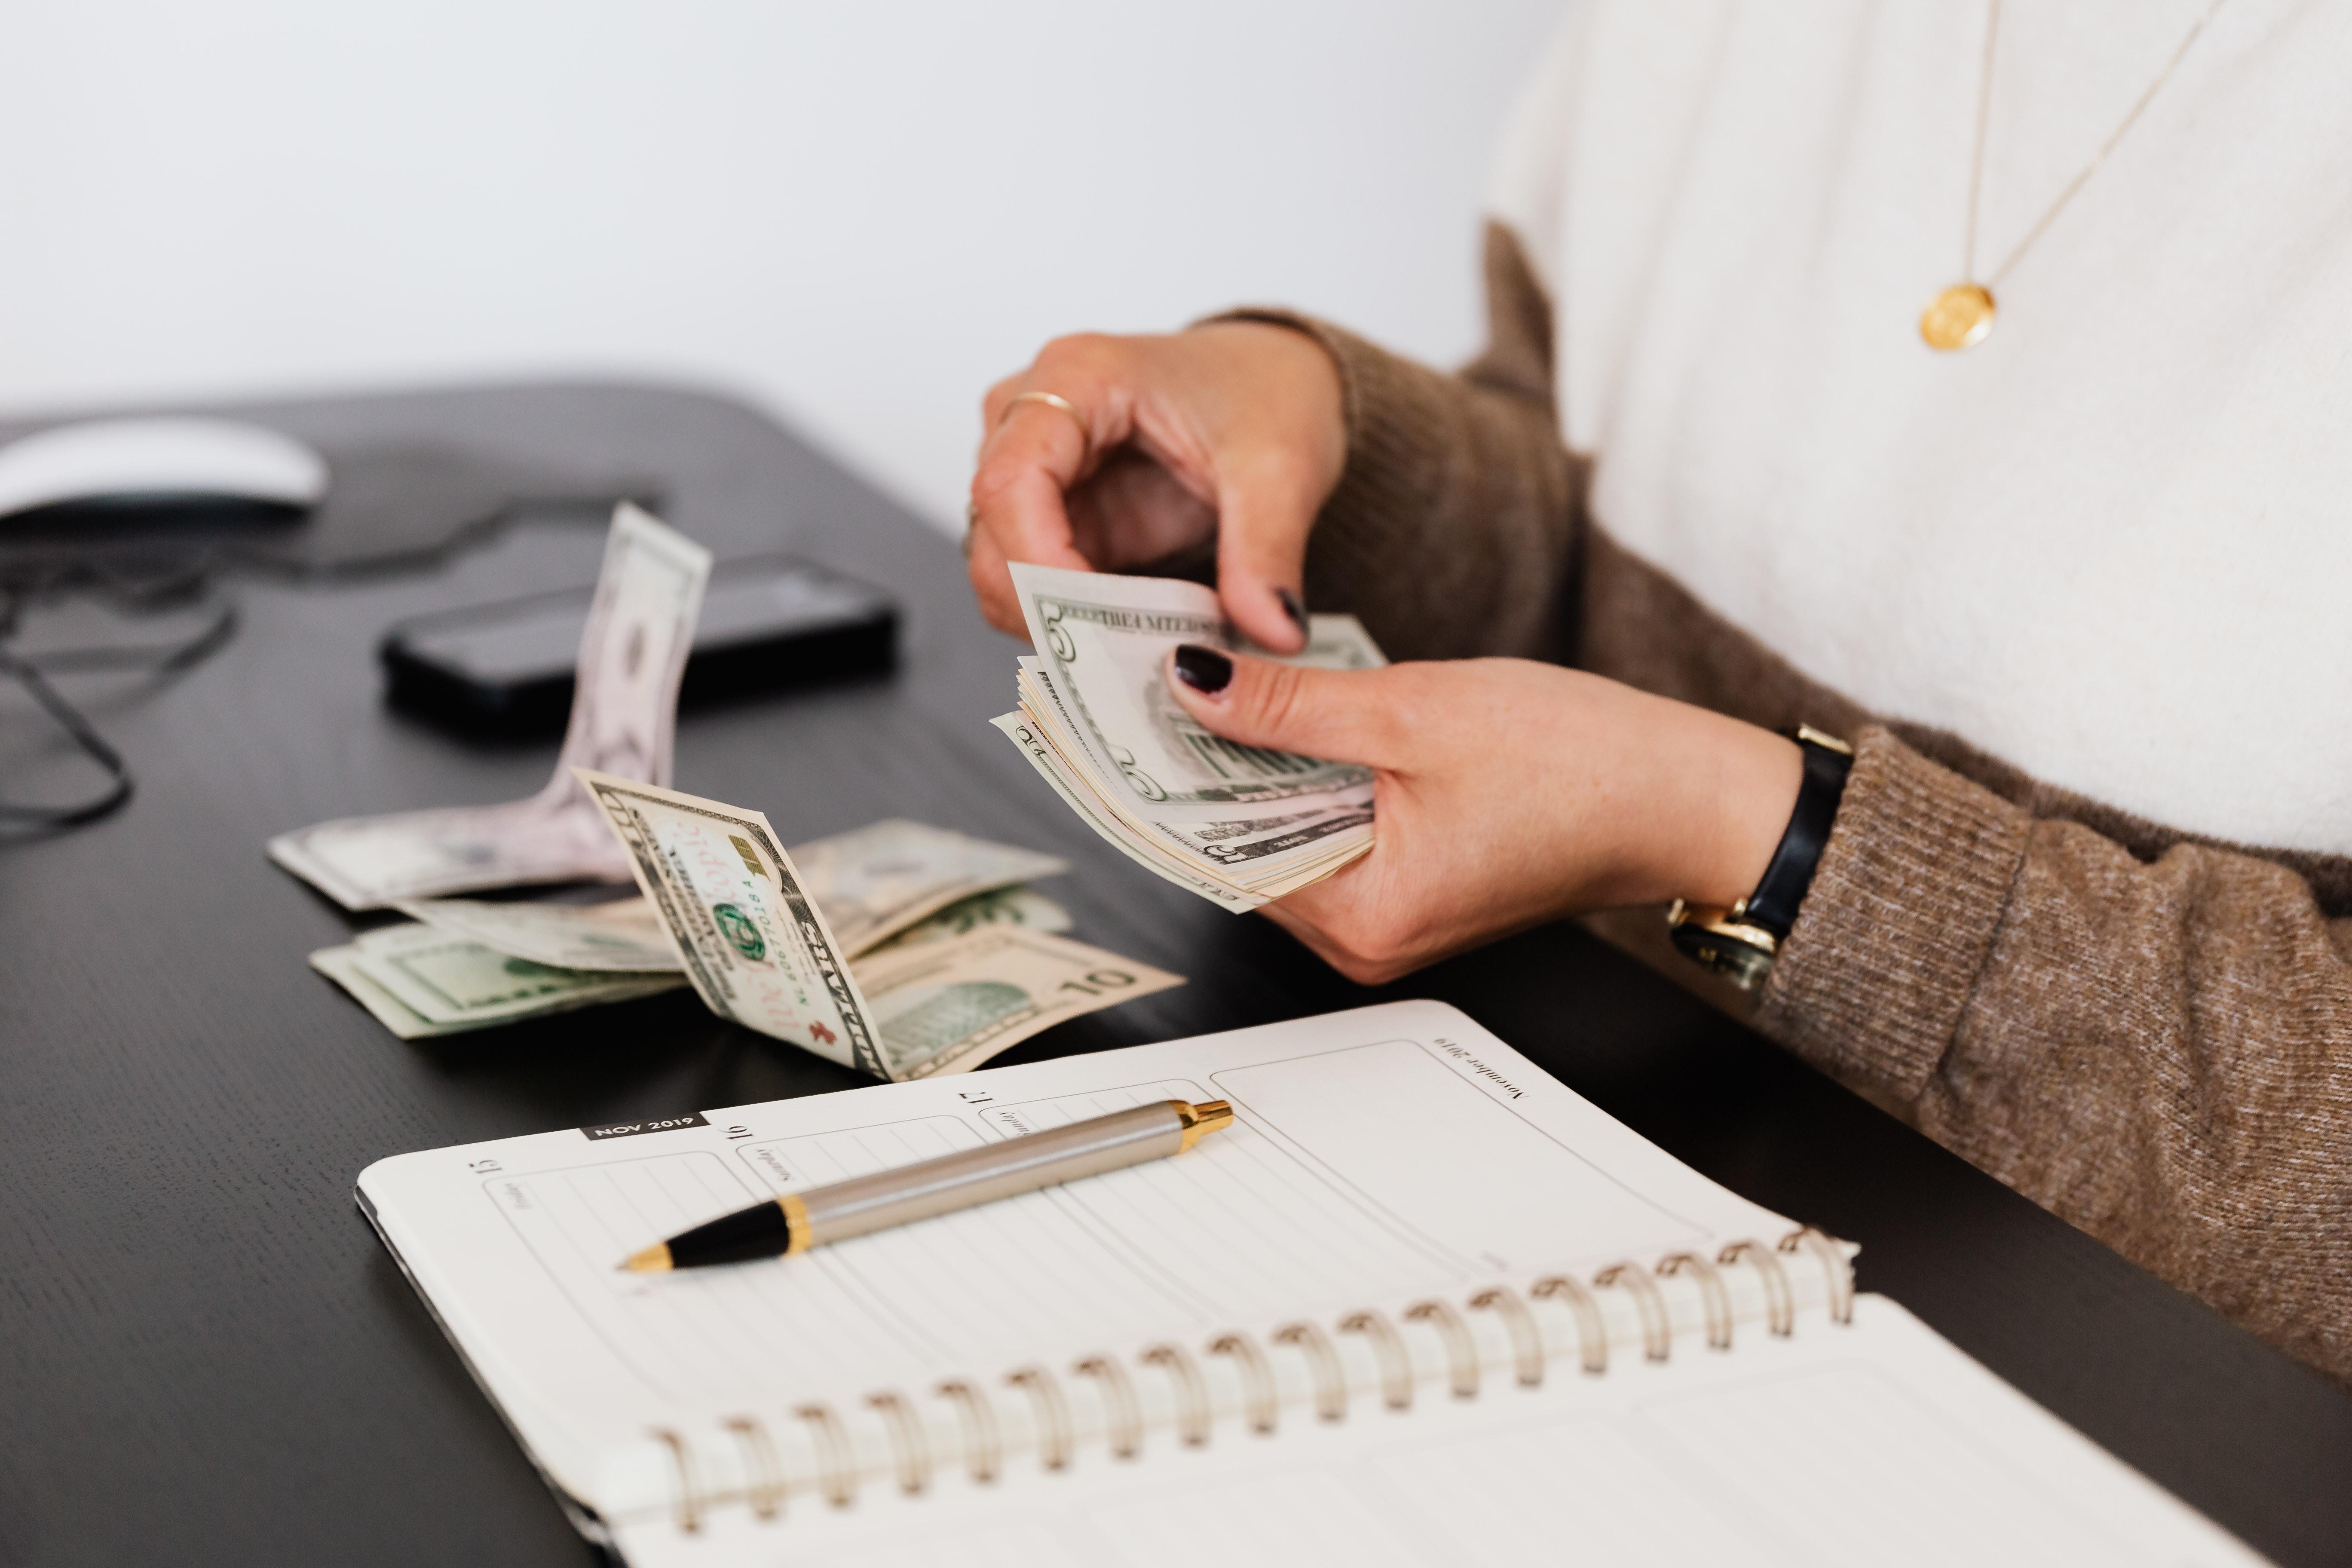 6 Steps Toward Your Retirement Goals